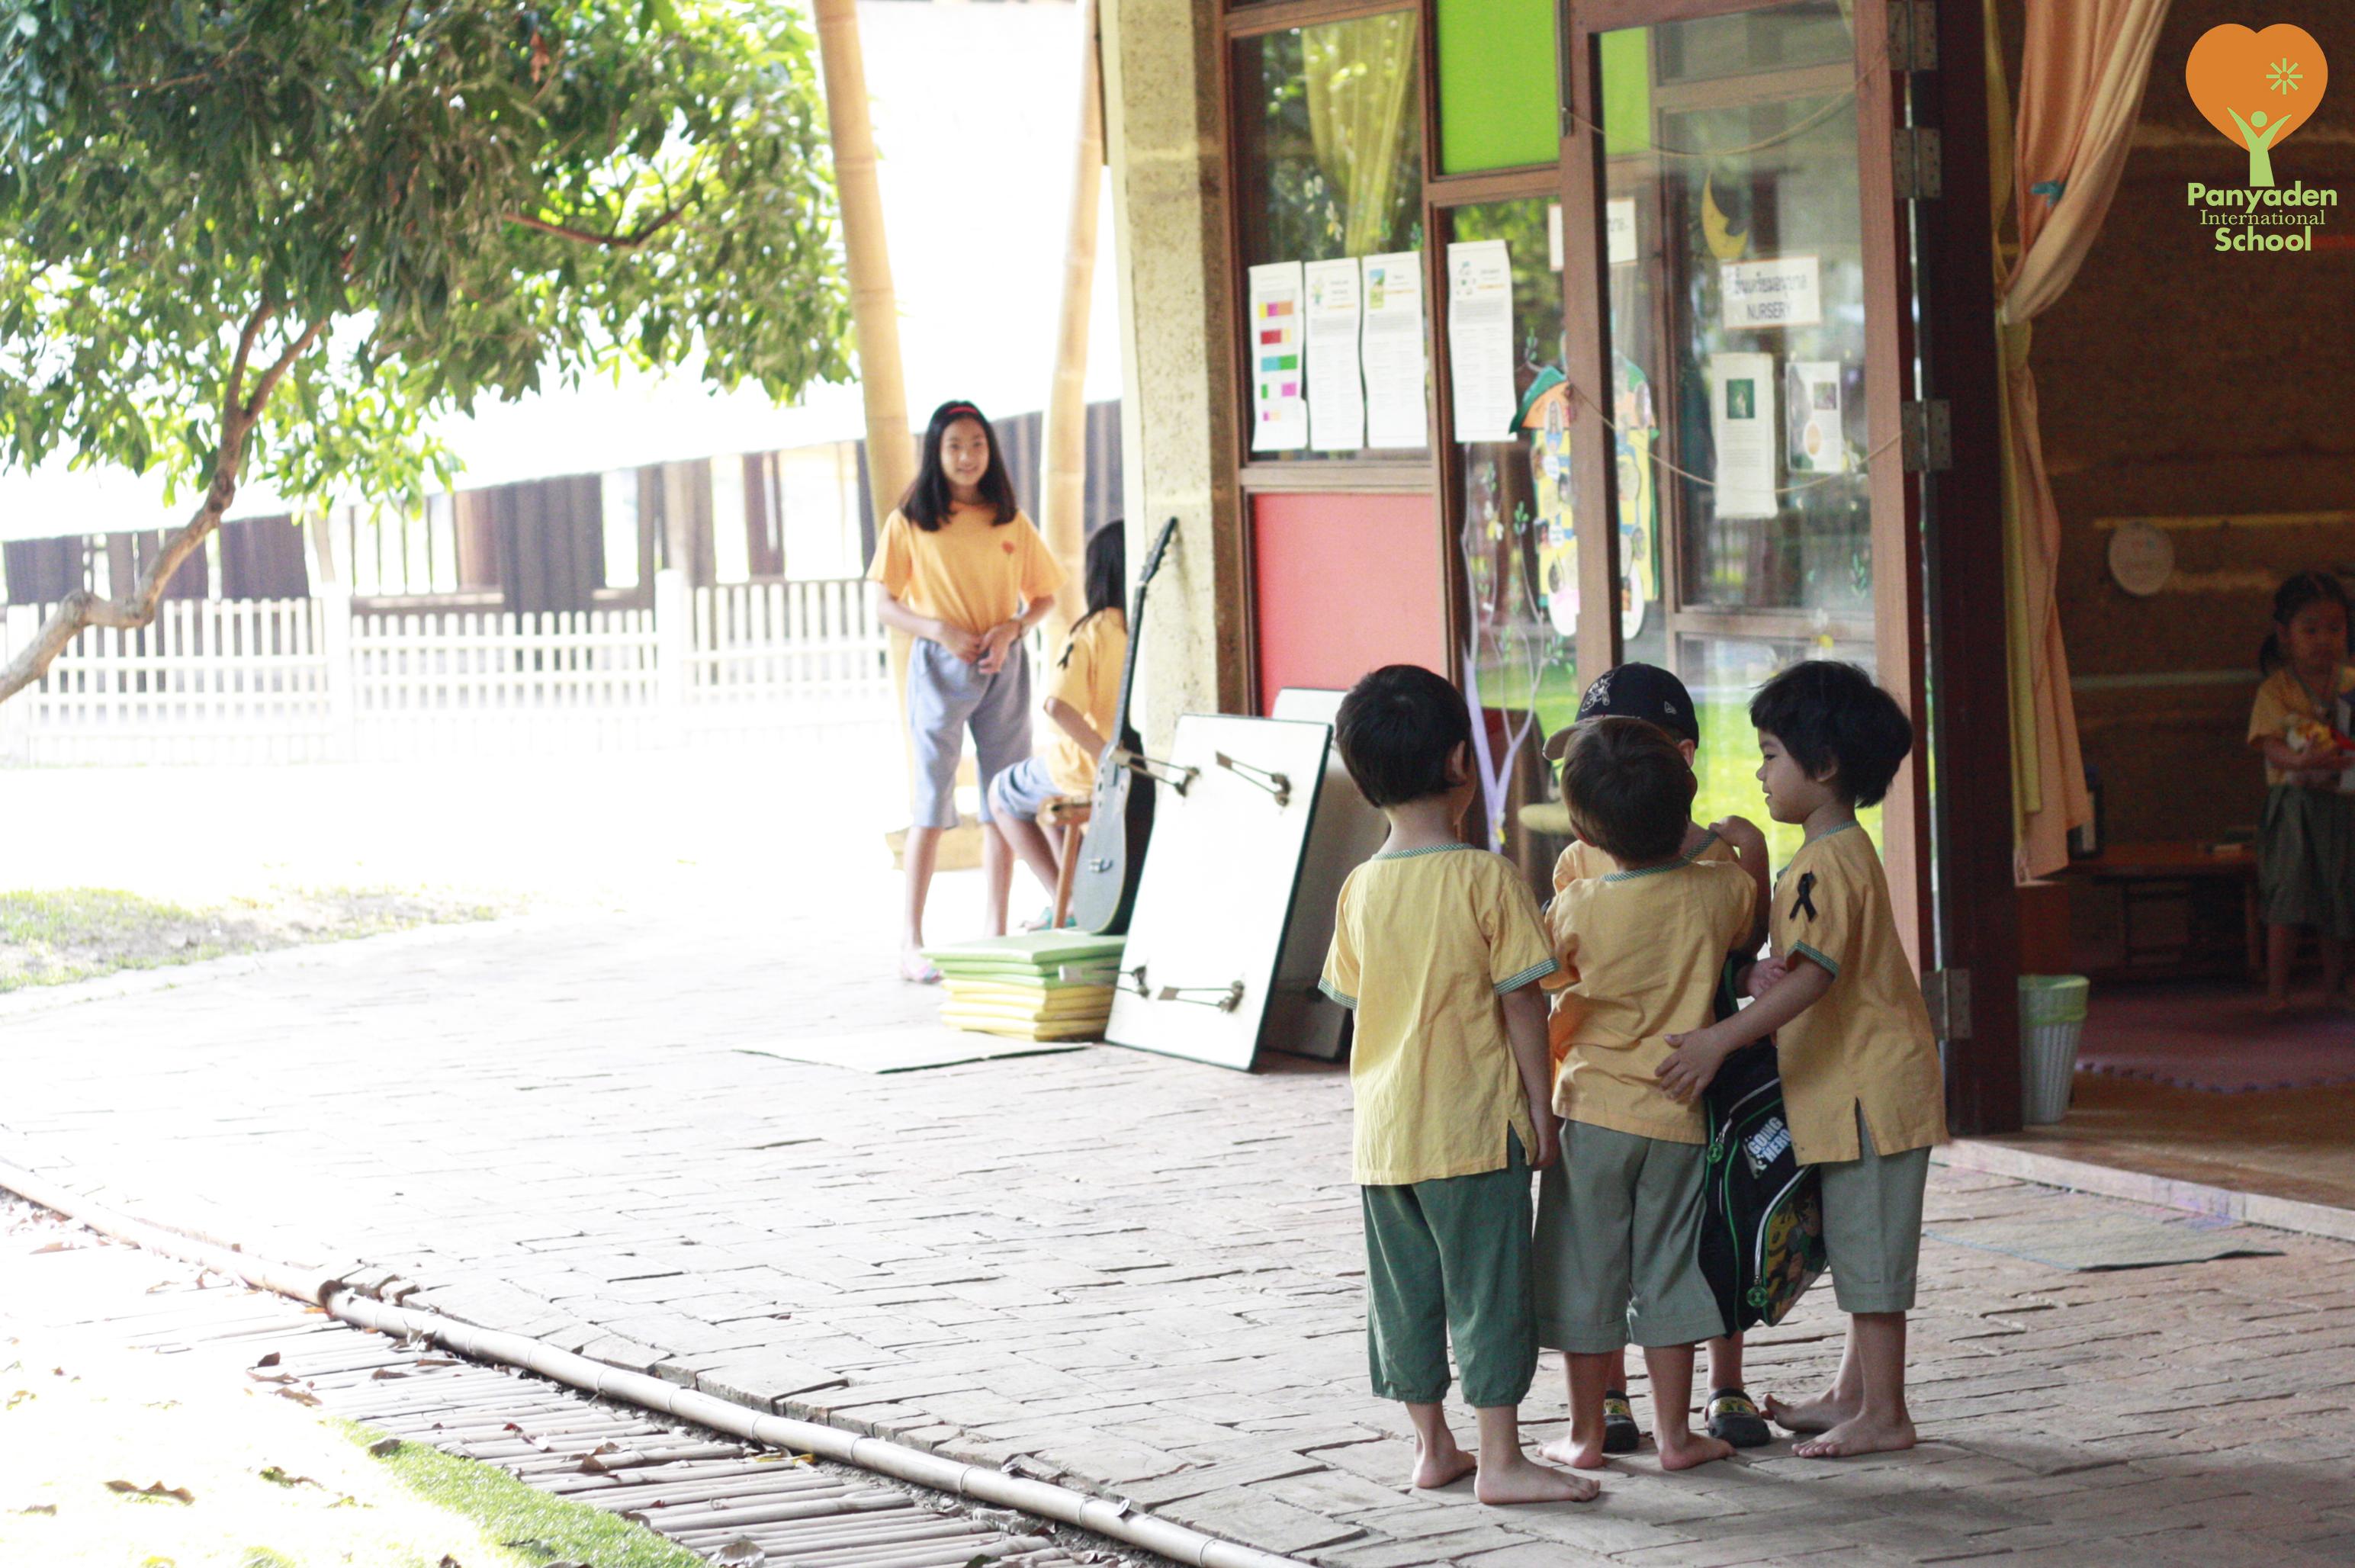 A hug for our classmates. Back at Panyaden.